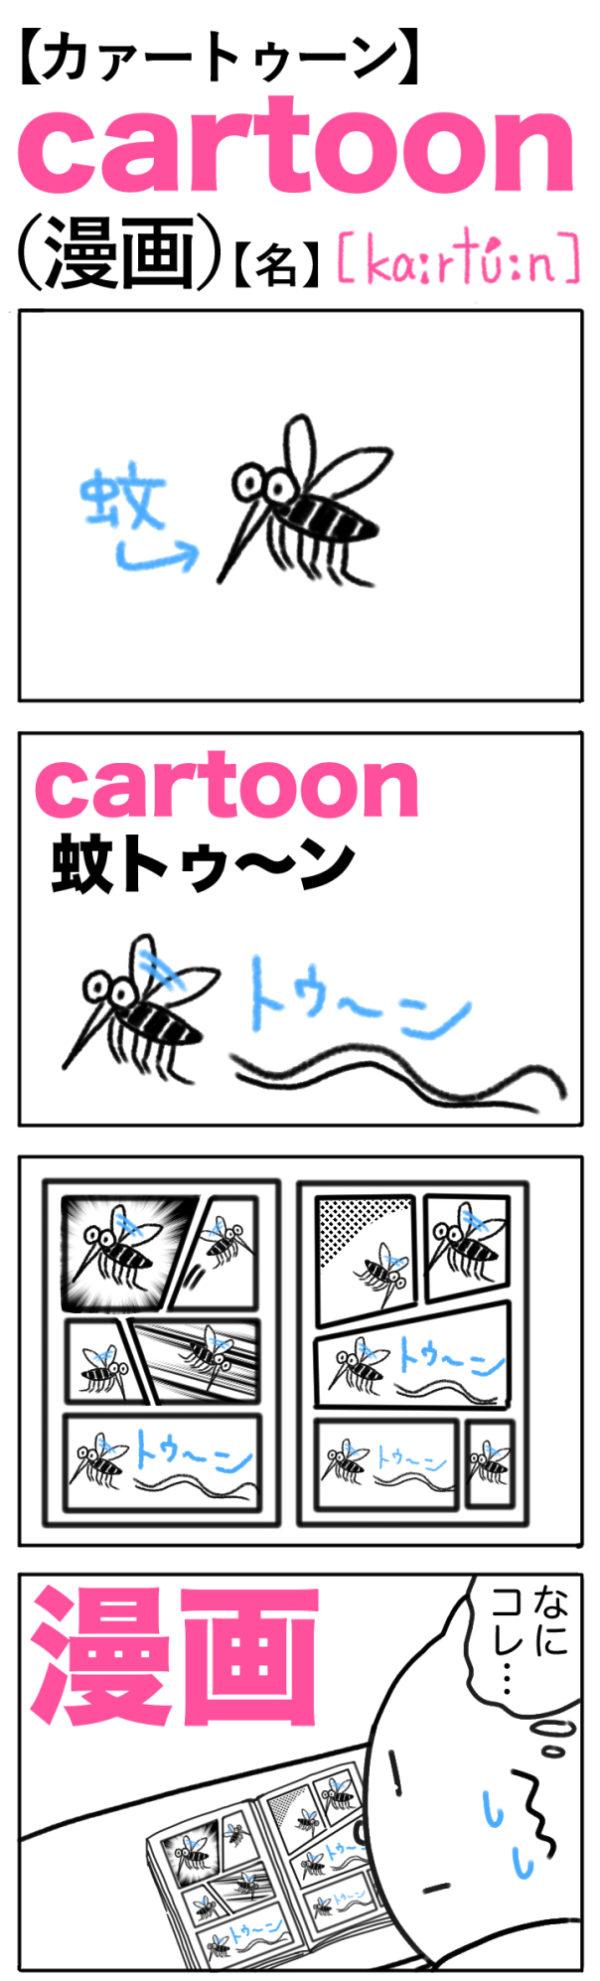 cartoon(漫画) の語呂合わせ英単語